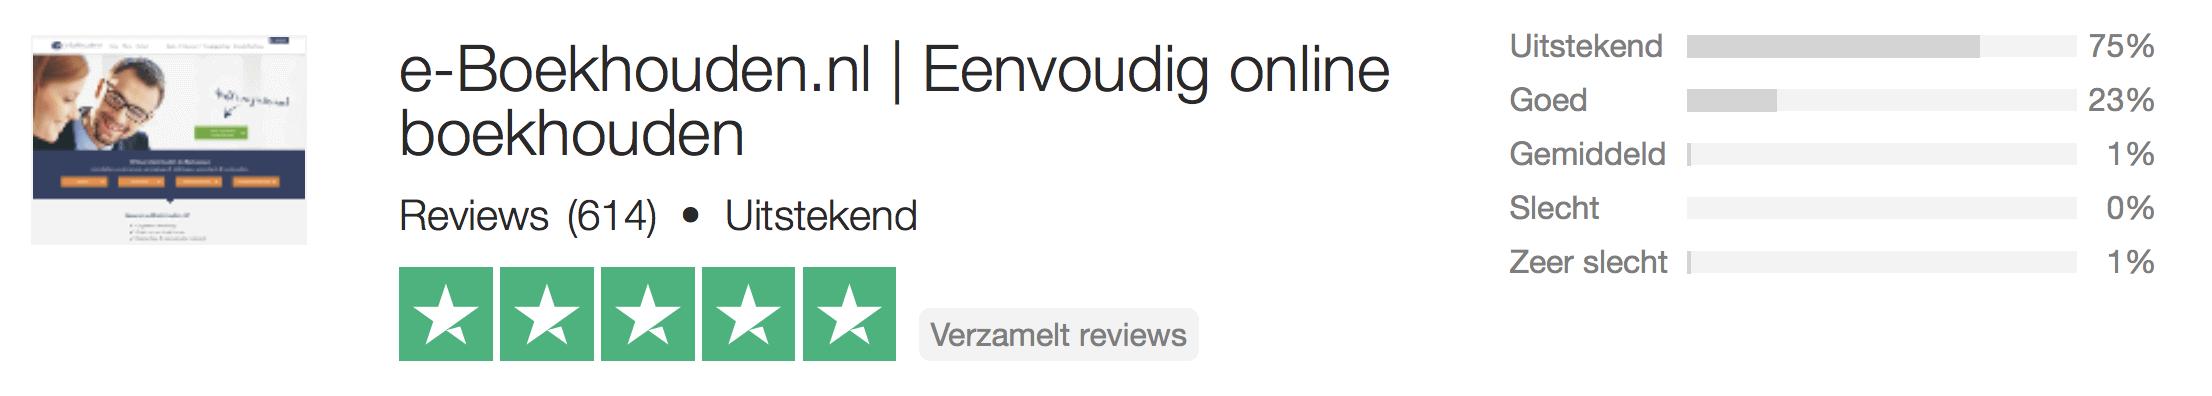 e-Boekhouden-review Trustpilot